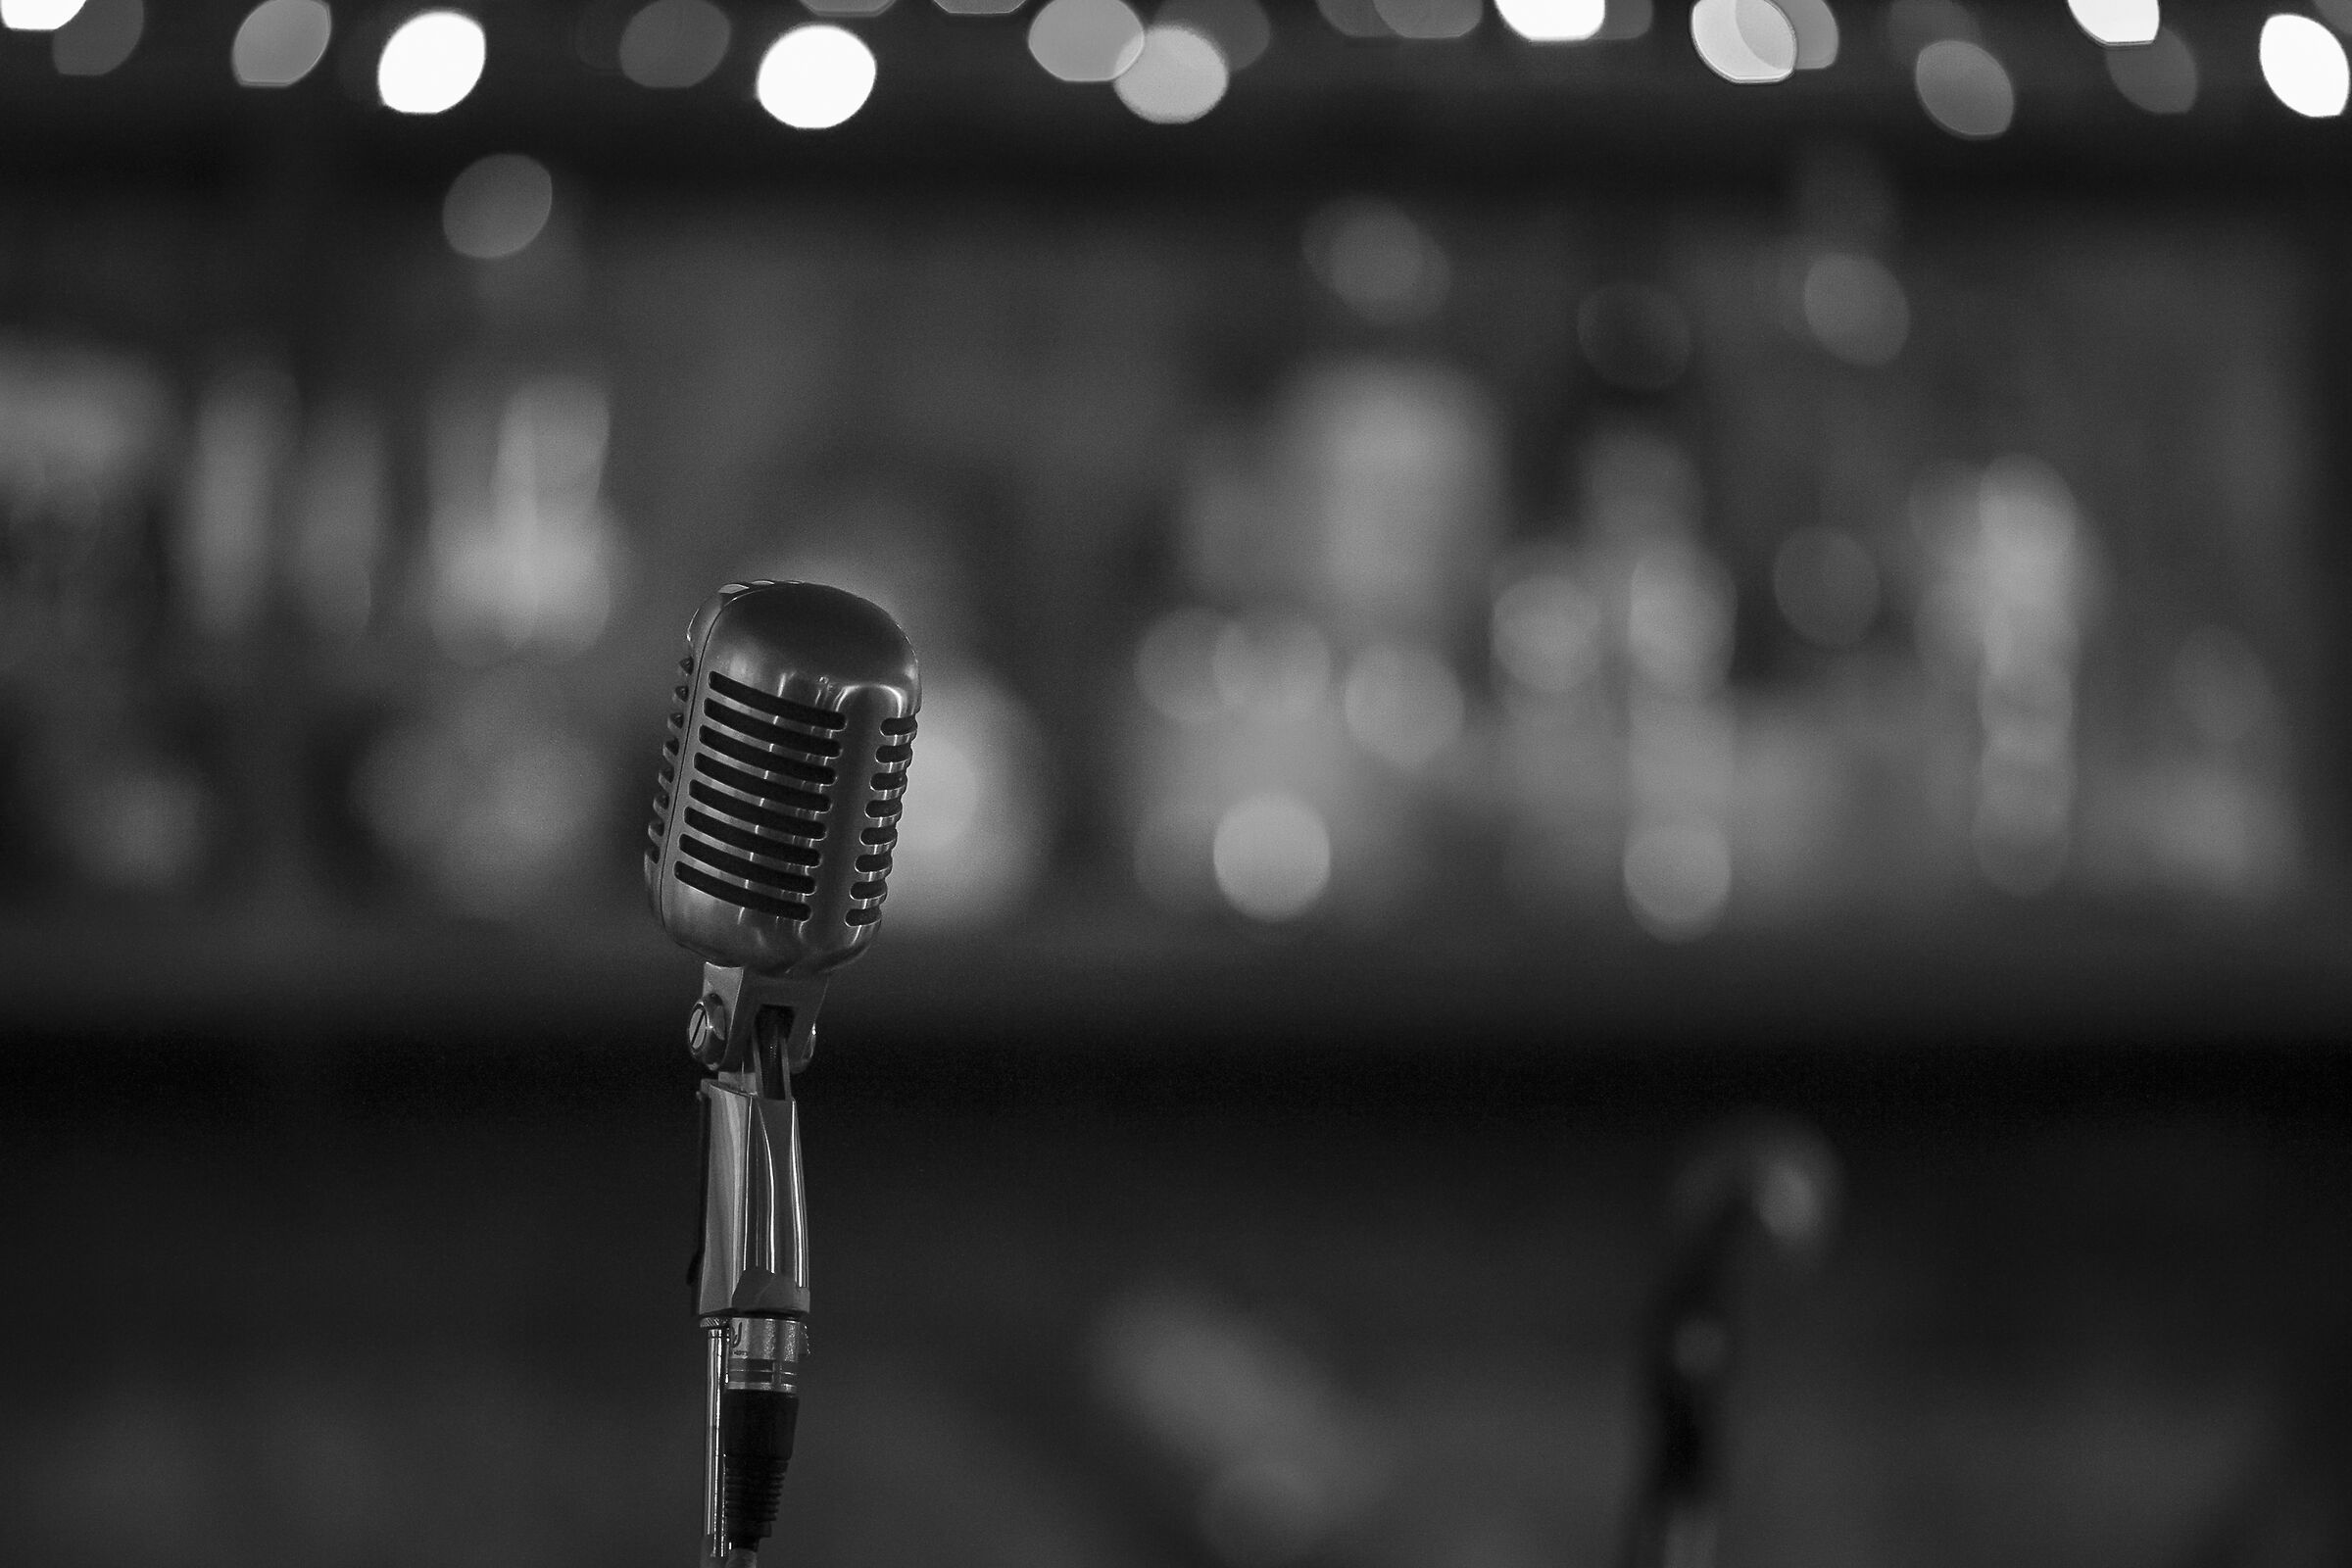 The Brilliantna's microphone...